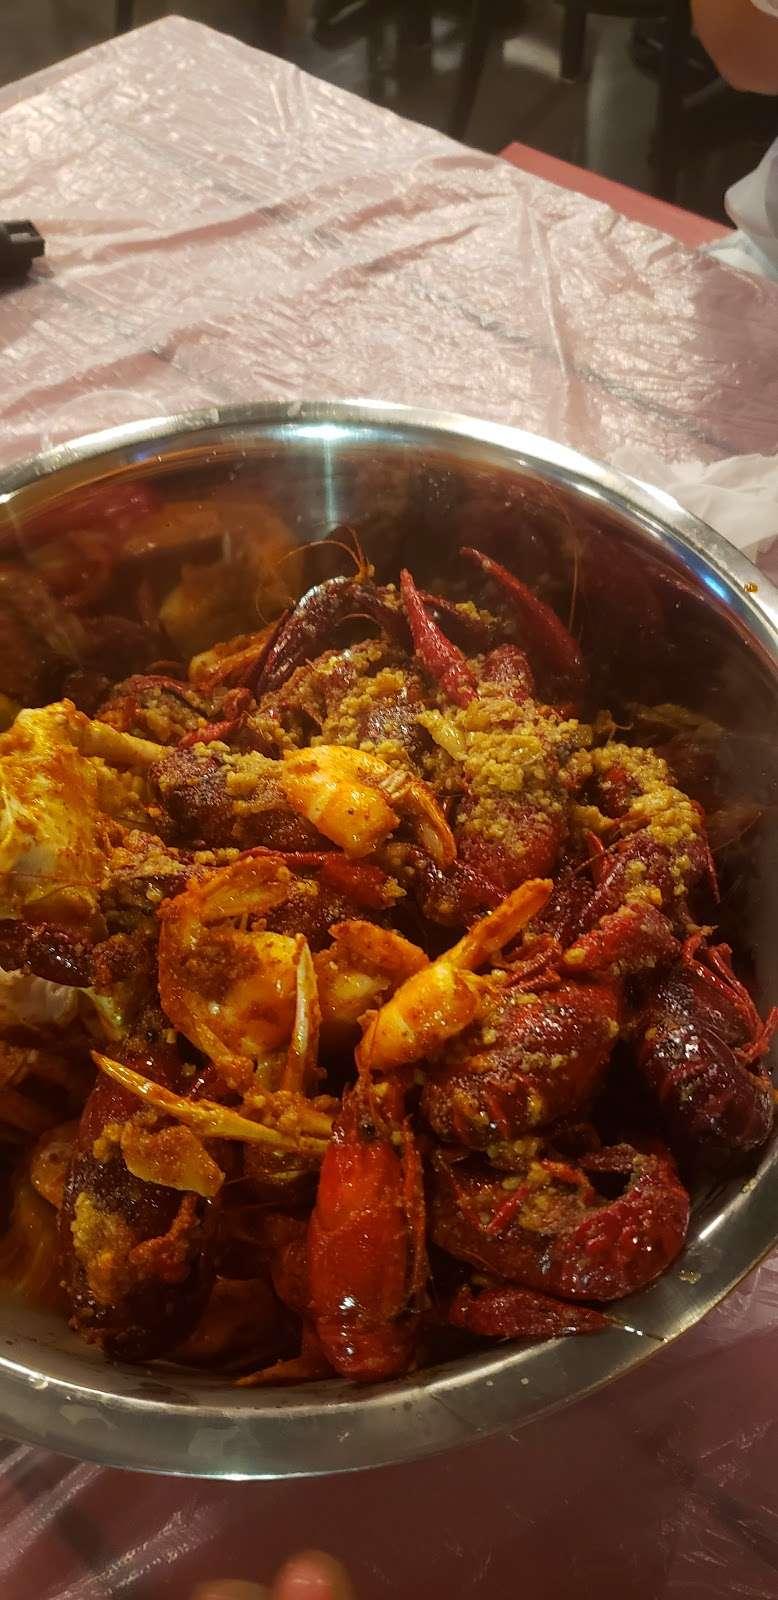 Crawfish House - restaurant    Photo 10 of 10   Address: 9990 Almeda Genoa Rd Suite 100, Houston, TX 77075, USA   Phone: (281) 715-0033